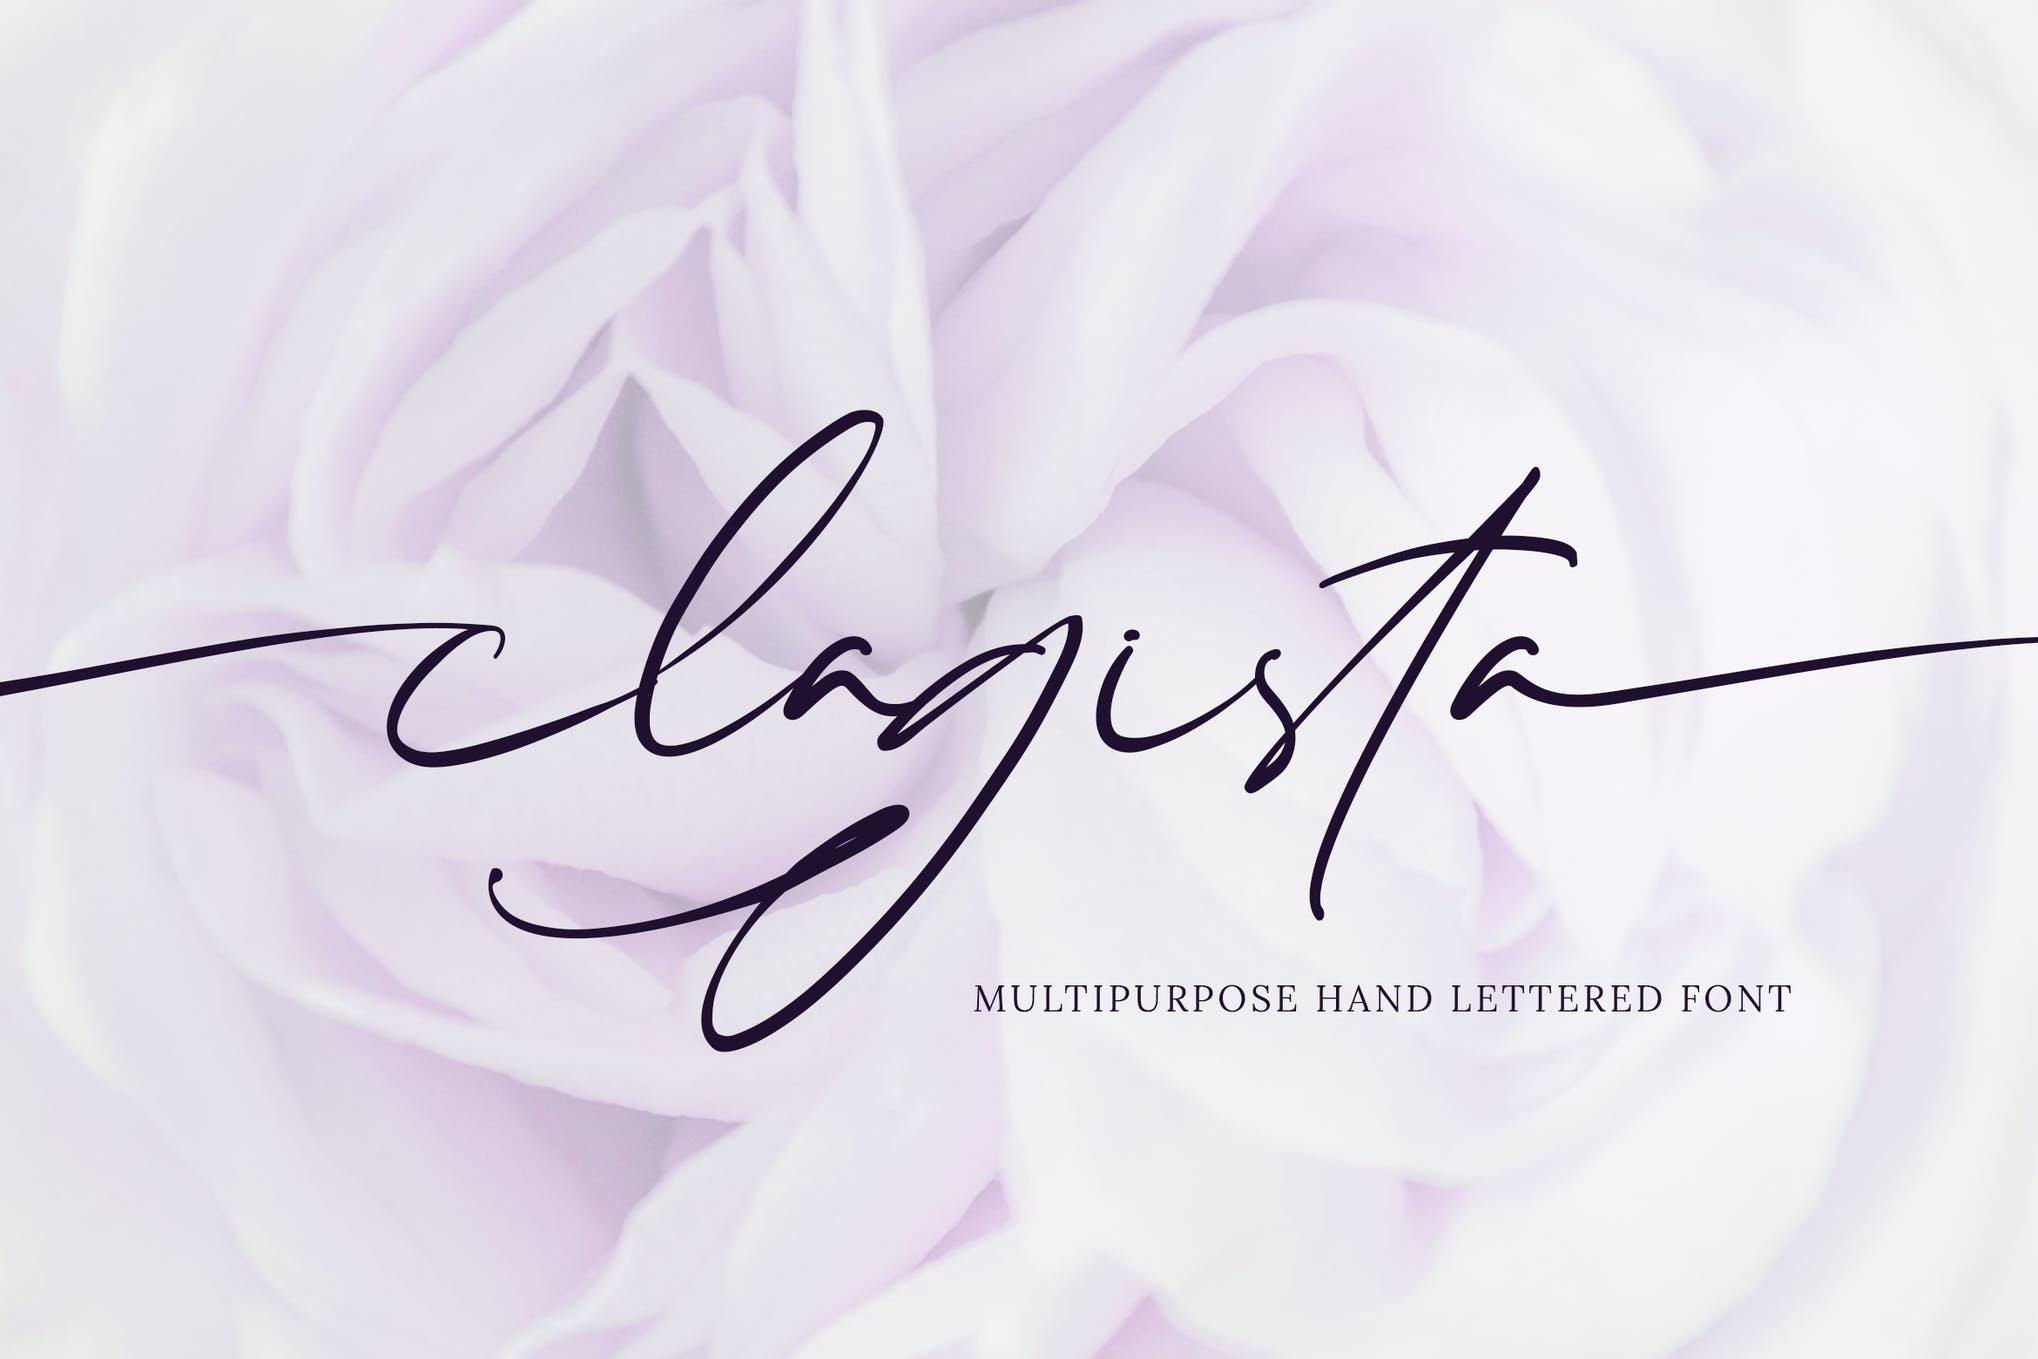 Clagista handwriting font